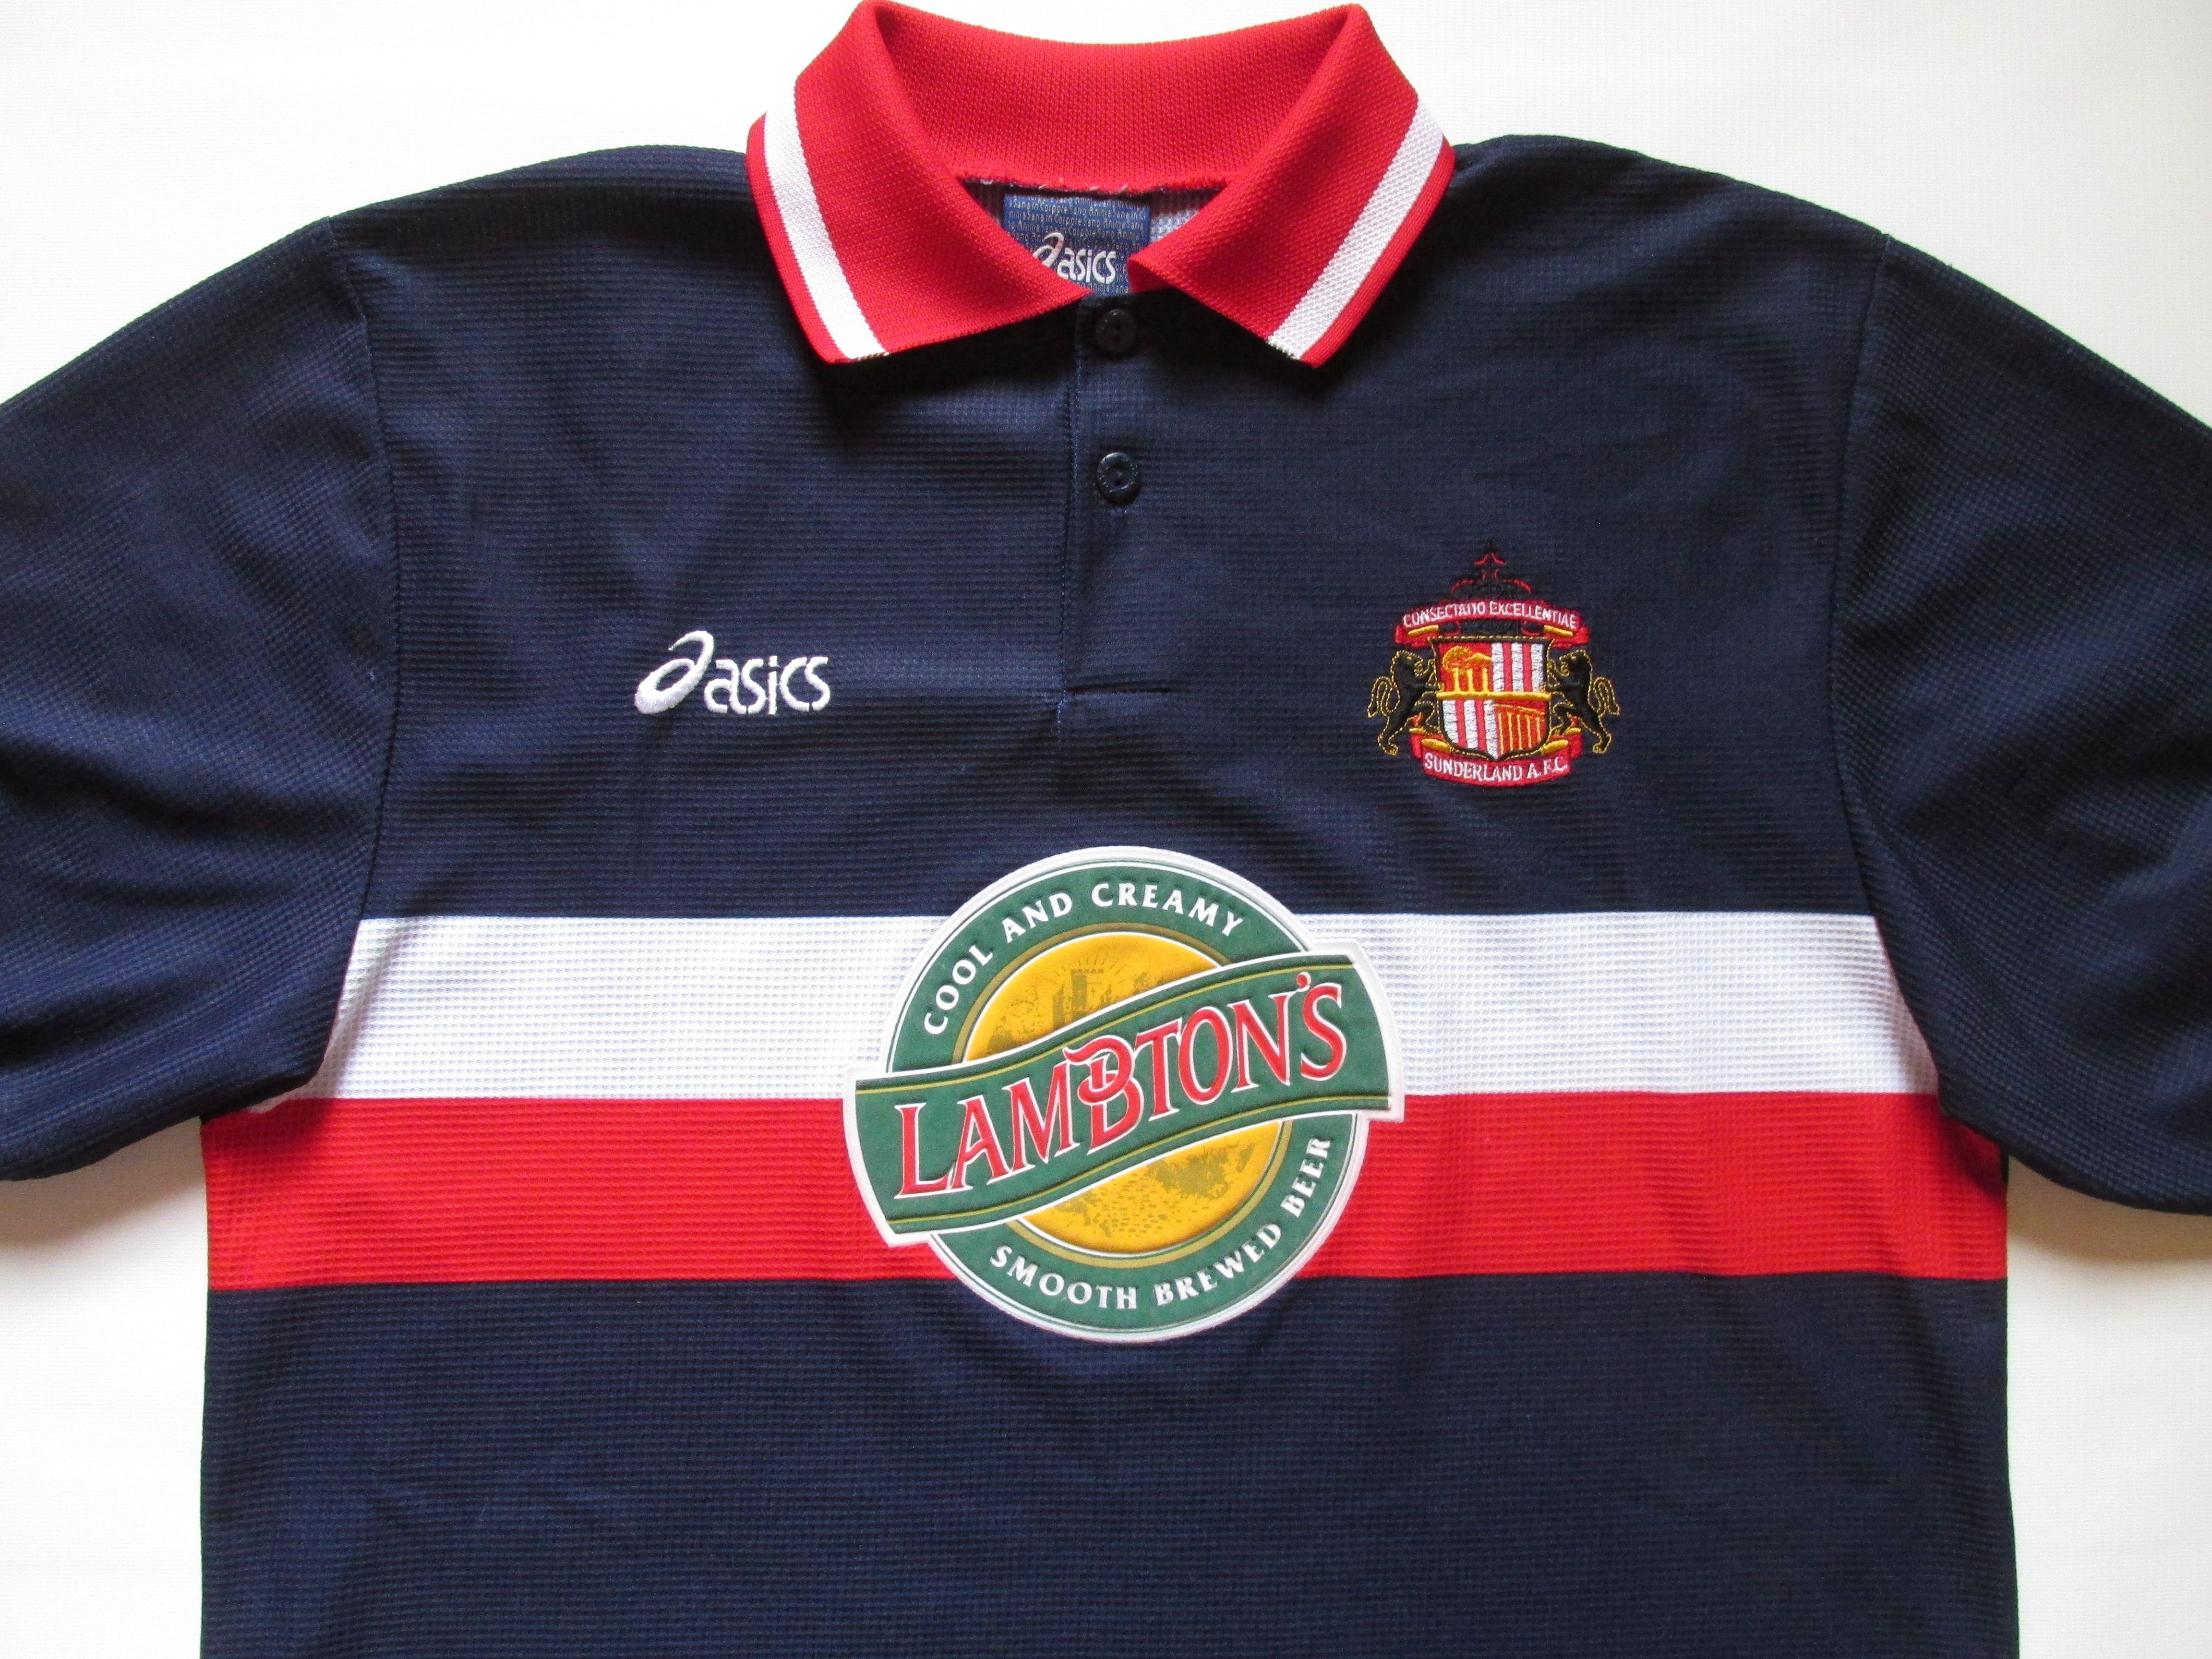 Sunderland 1998 1999 Third Football Shirt By Asics Safc England Soccer Jersey Vintage 90s Retro S Vintage Football Shirts England Soccer Jersey Soccer Jersey